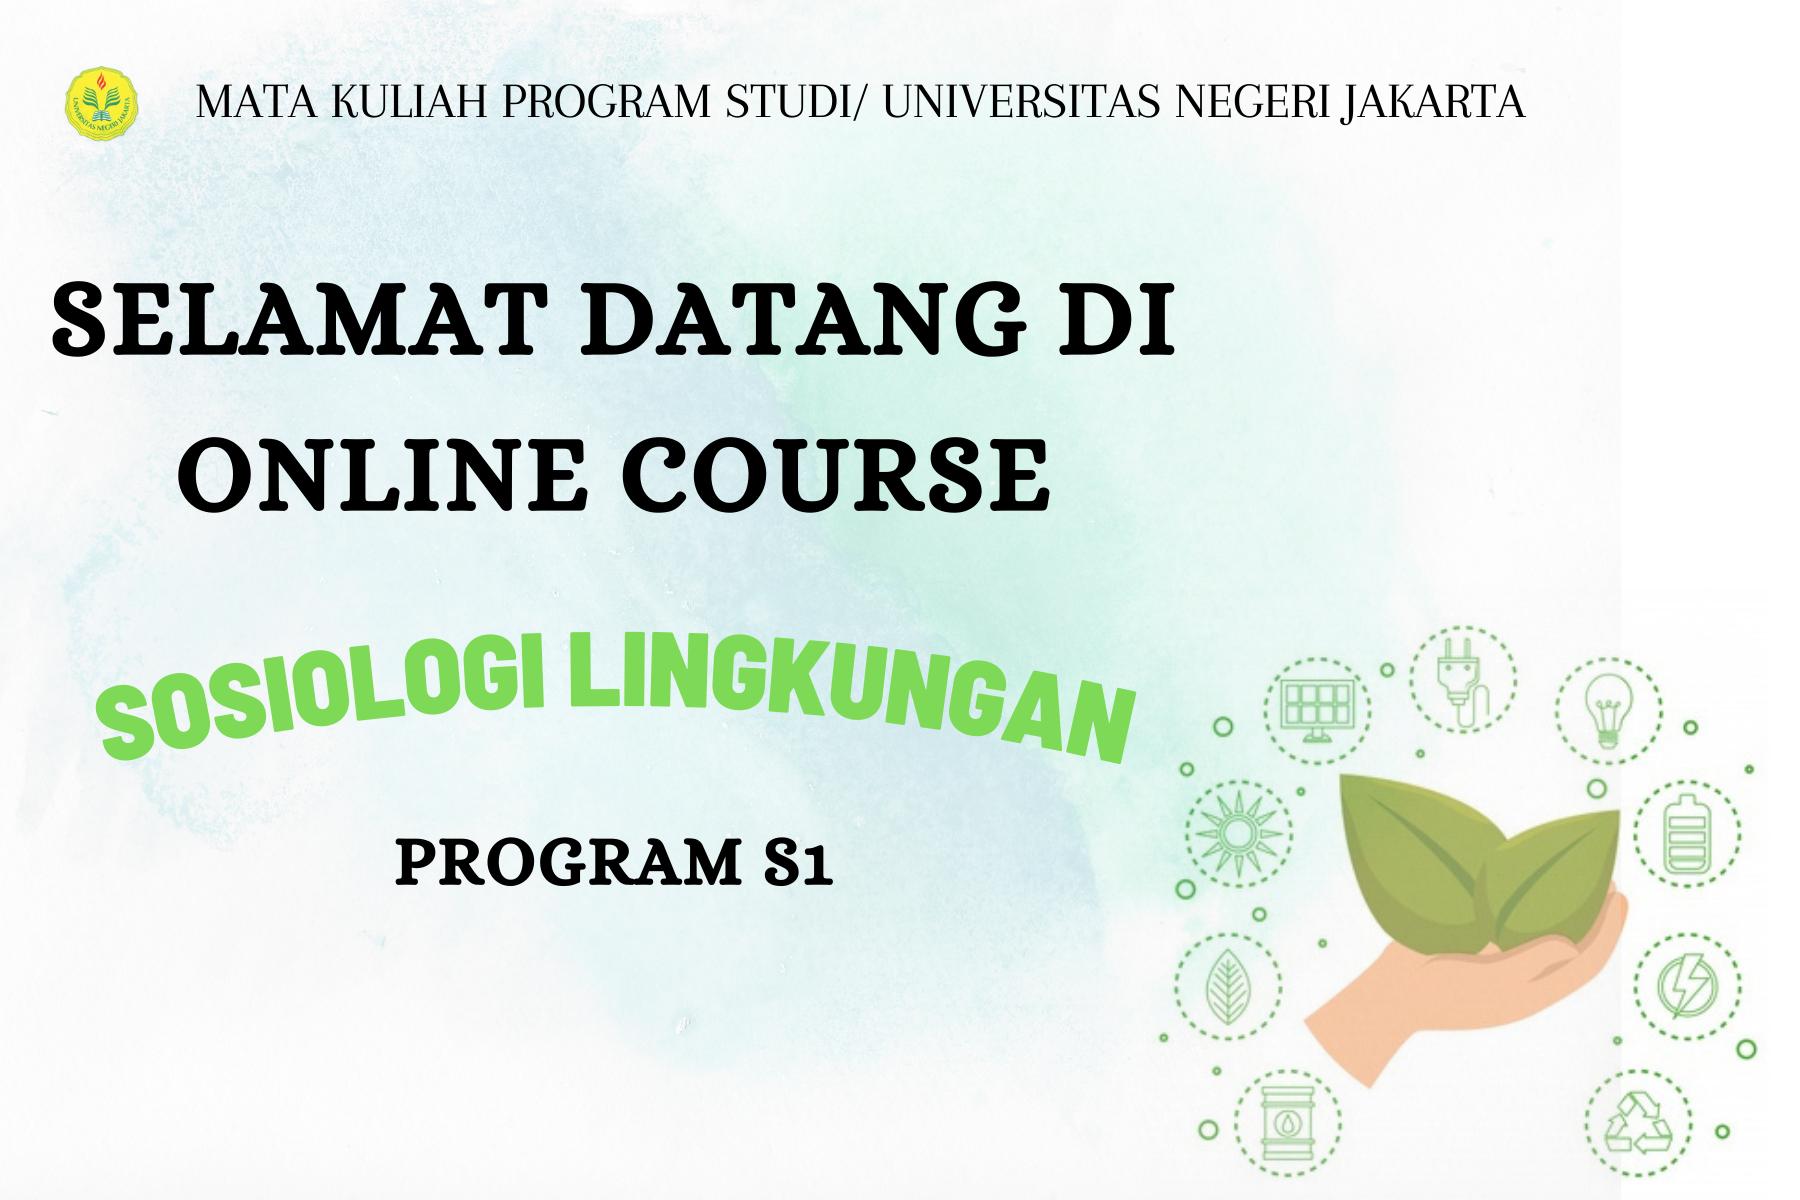 Sosiologi Lingkungan ( S1 Sosiologi, Prima Yustitia Nurul Islami, 140660016))